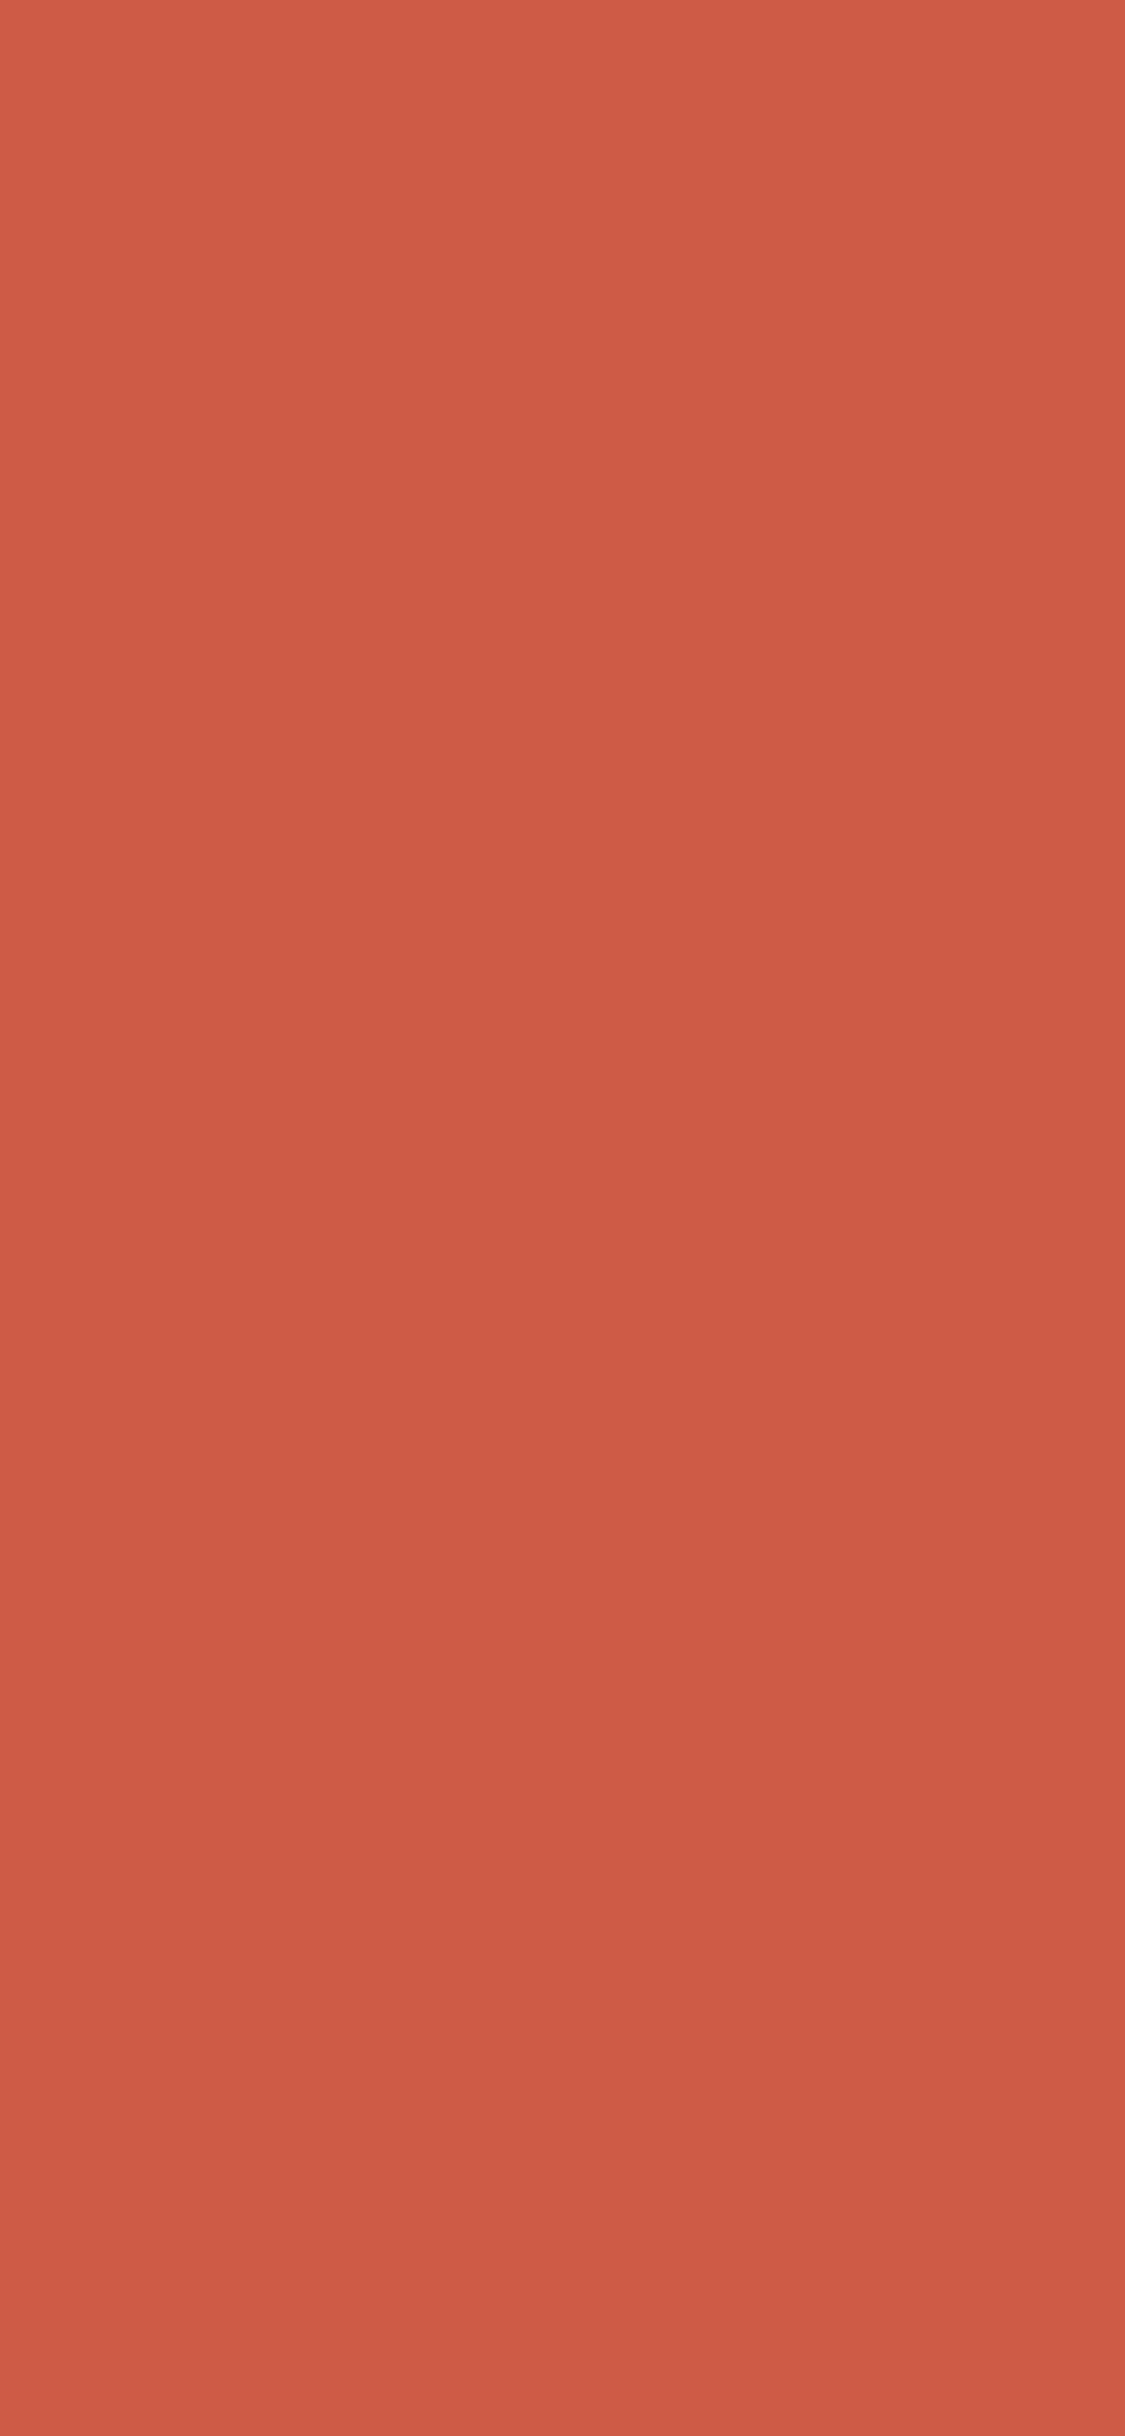 1125x2436 Dark Coral Solid Color Background